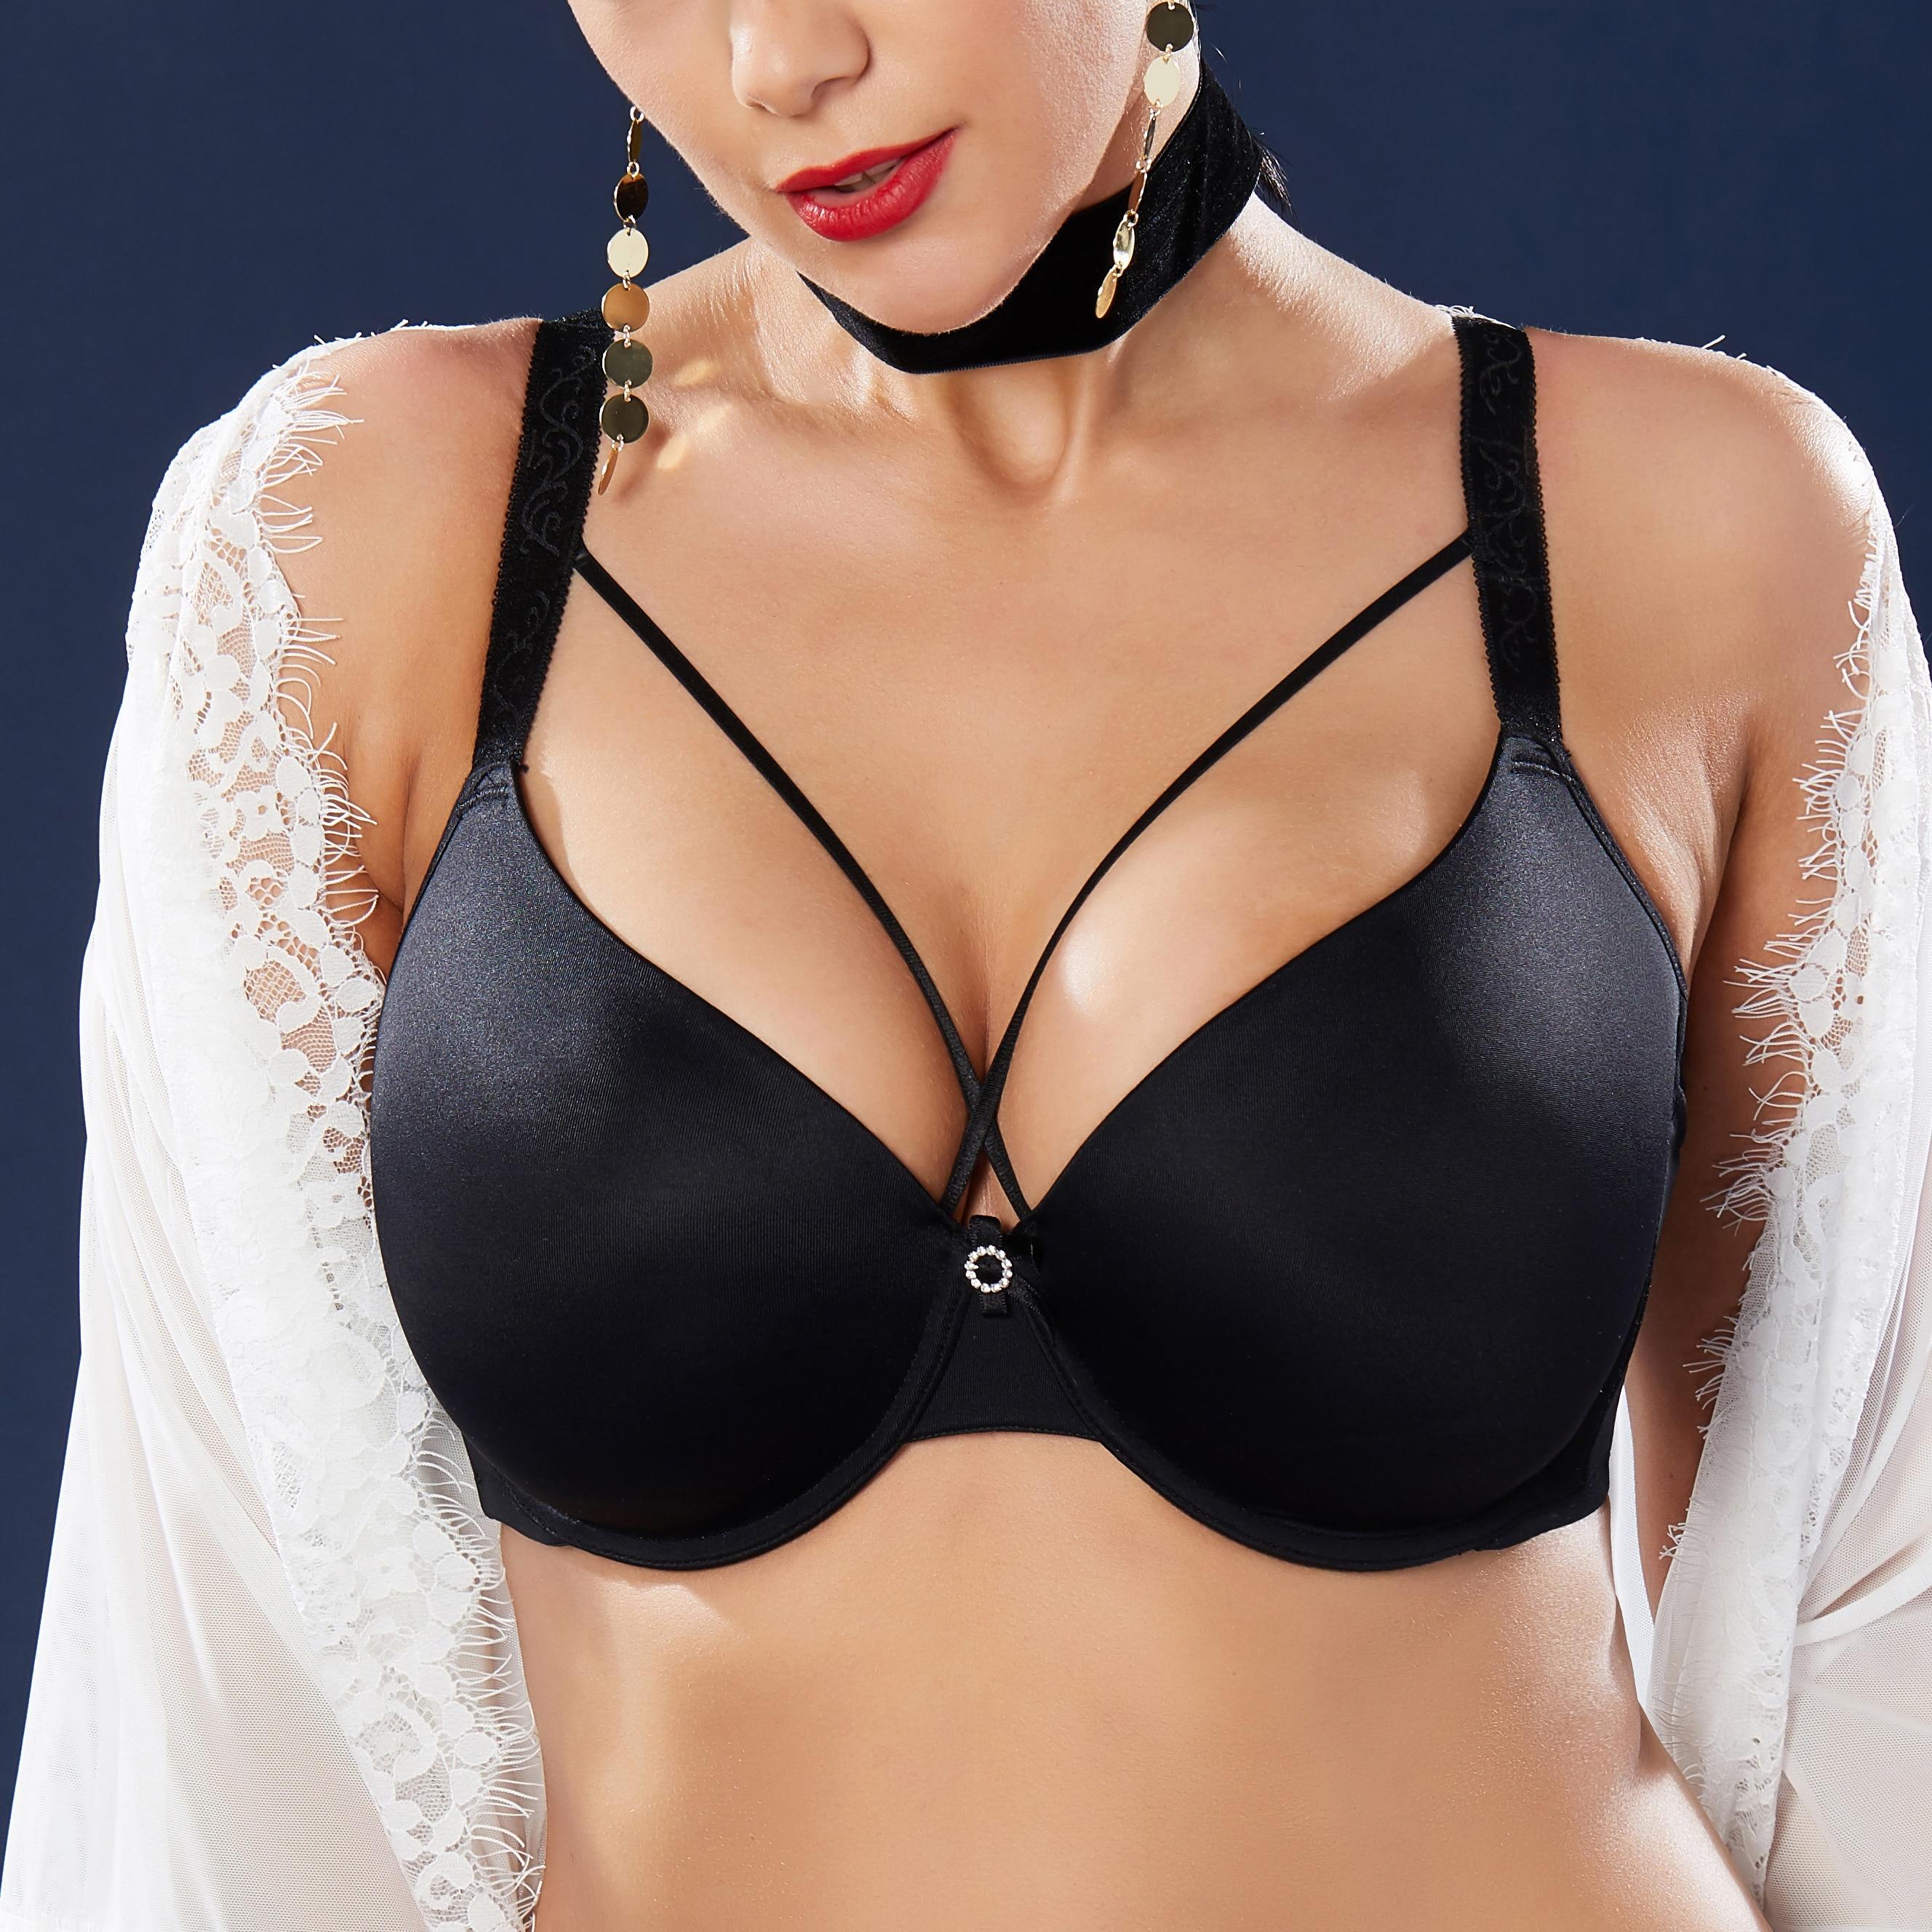 Women's Smooth Full Coverage Big Size T-Shirt Bra 34 36 38 40 42 44 46 B C D E F G